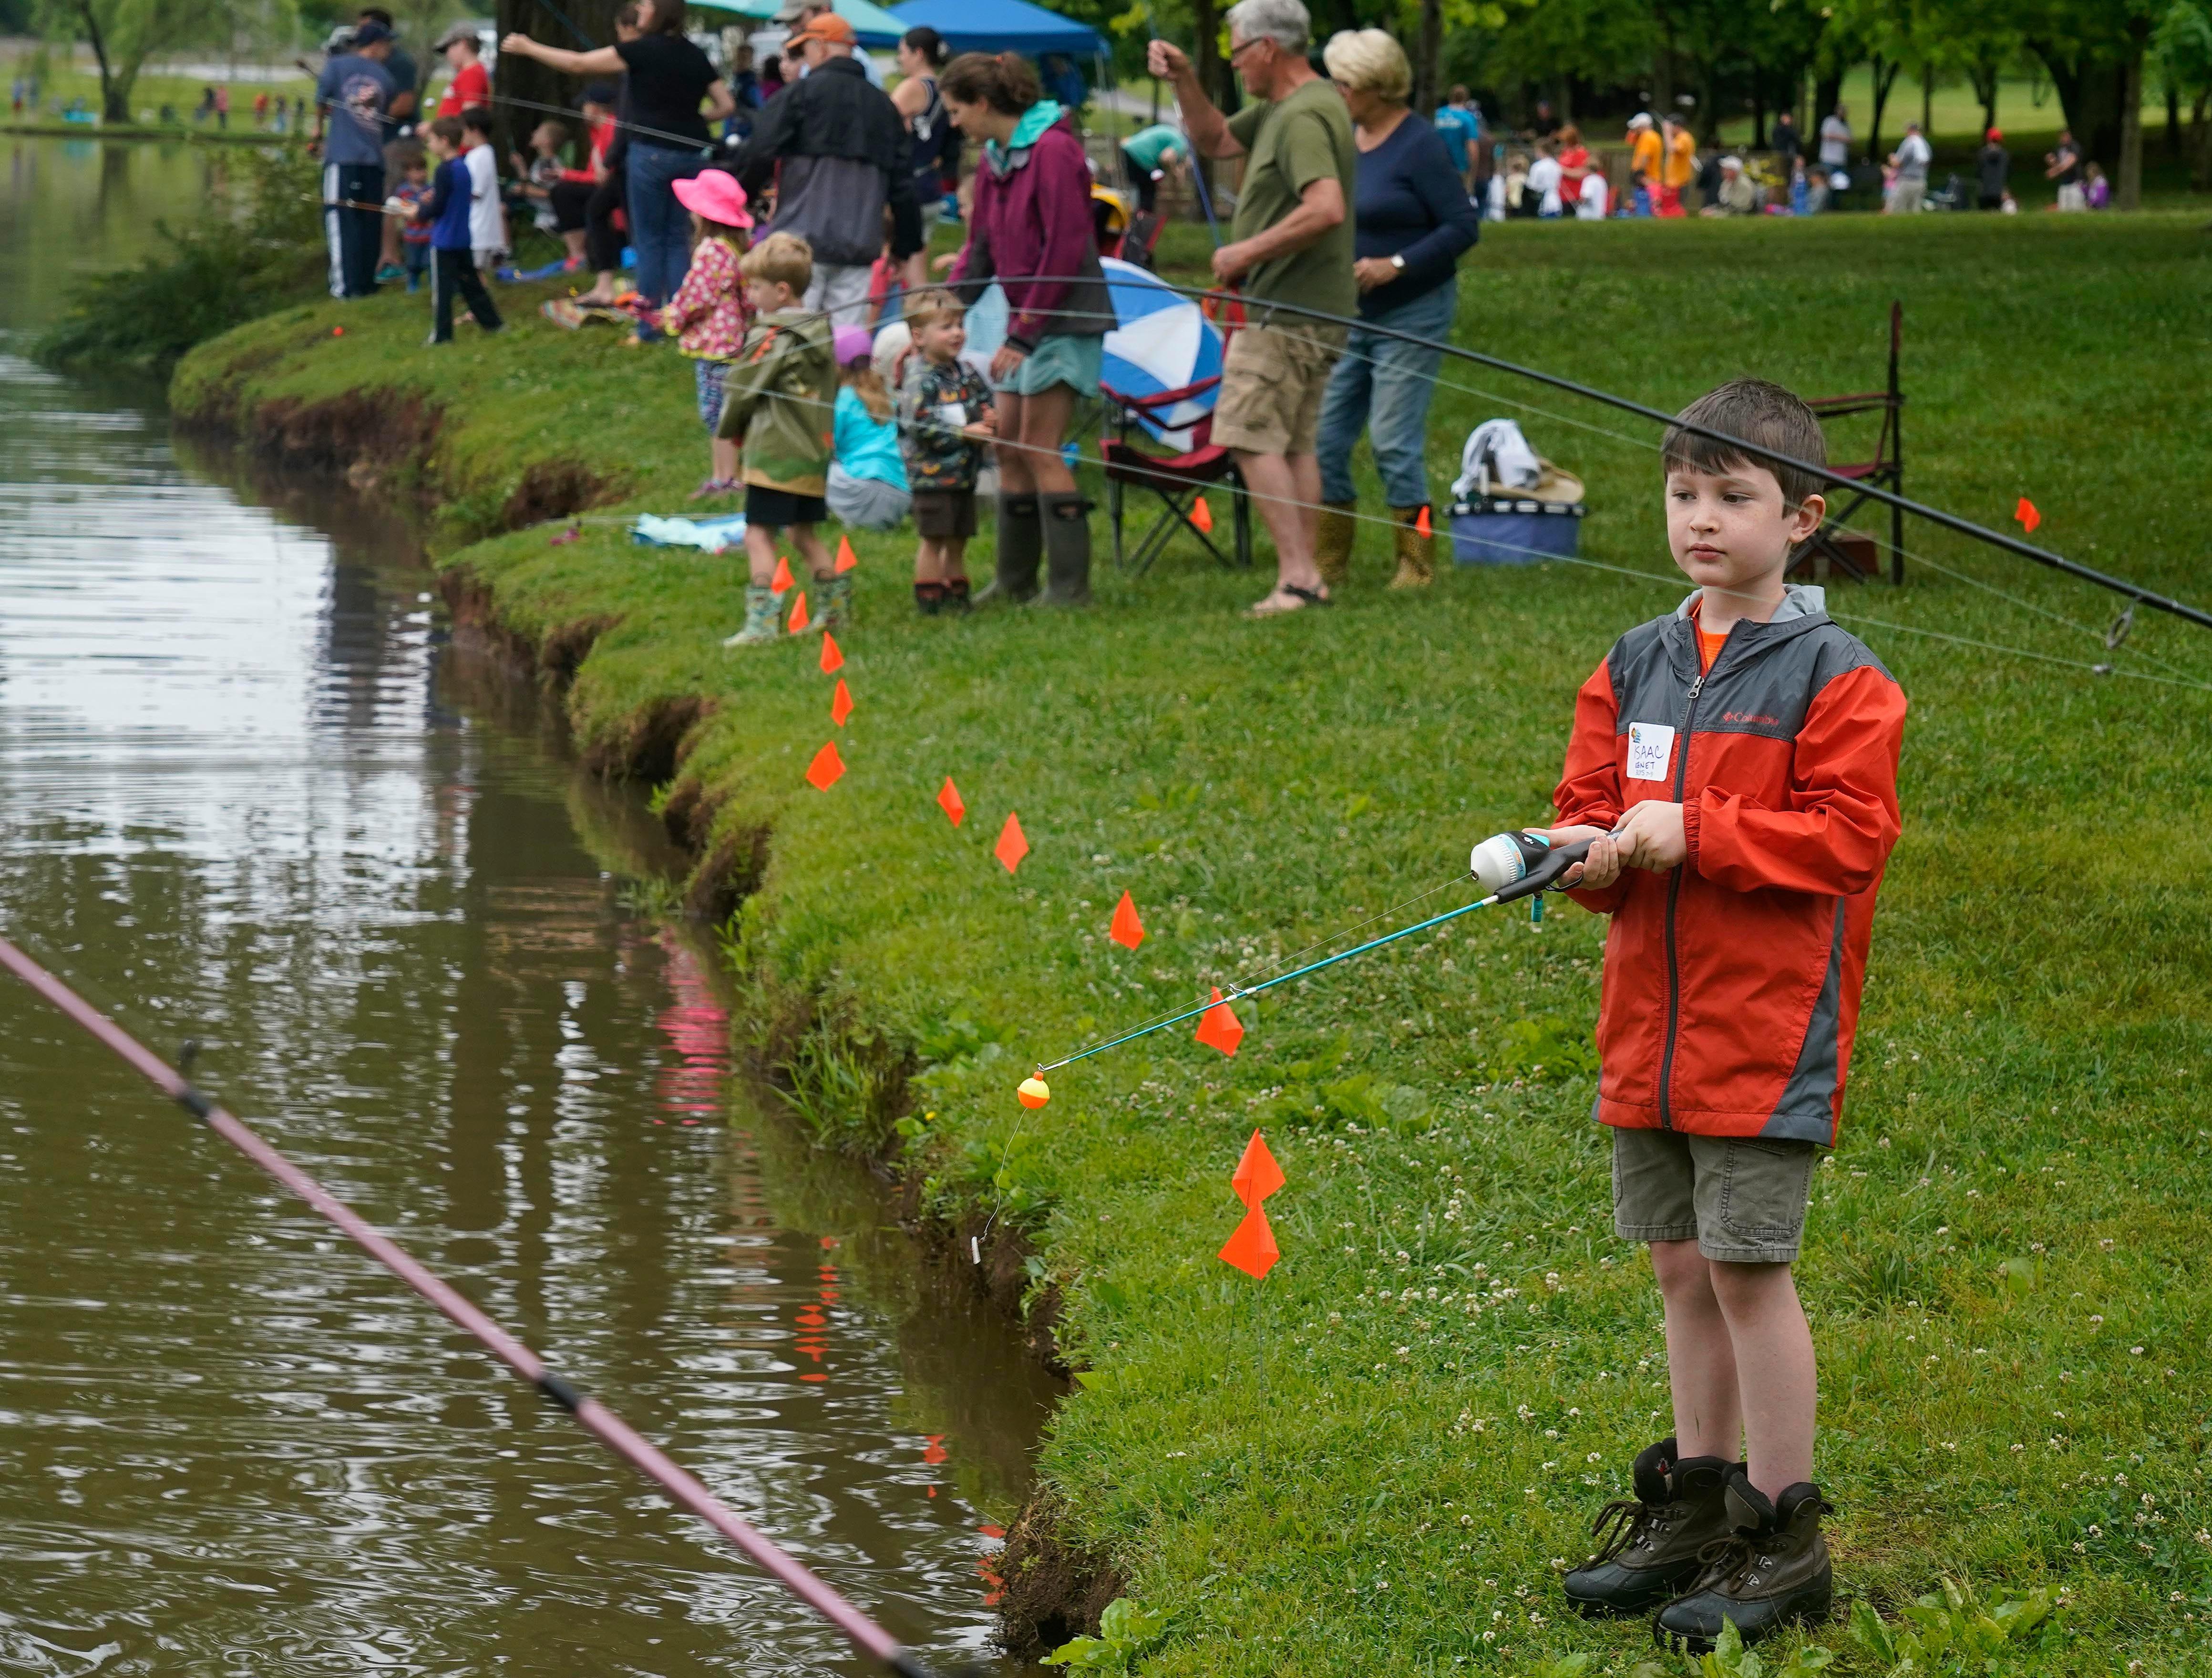 The 35th Annual Bob Watt Youth Fishing Rodeo was held Saturday, May. 11, 2019 at Anchor Park on Turkey Creek Road.